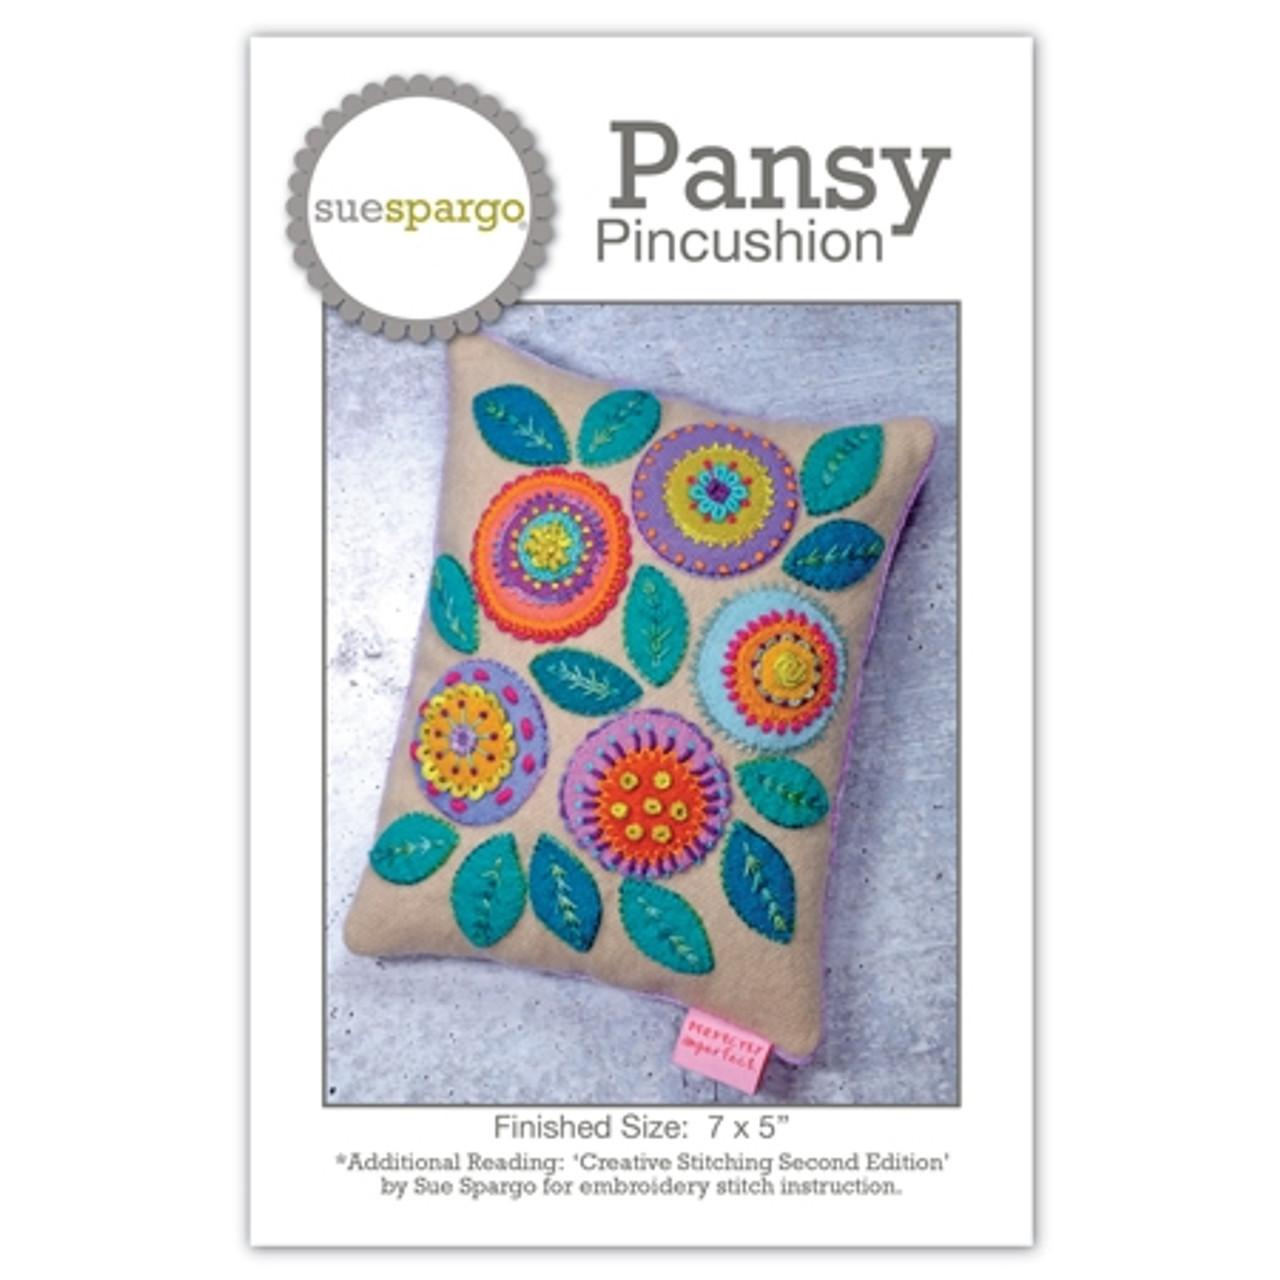 Sue Spargo : Pansy Pincushion Pattern